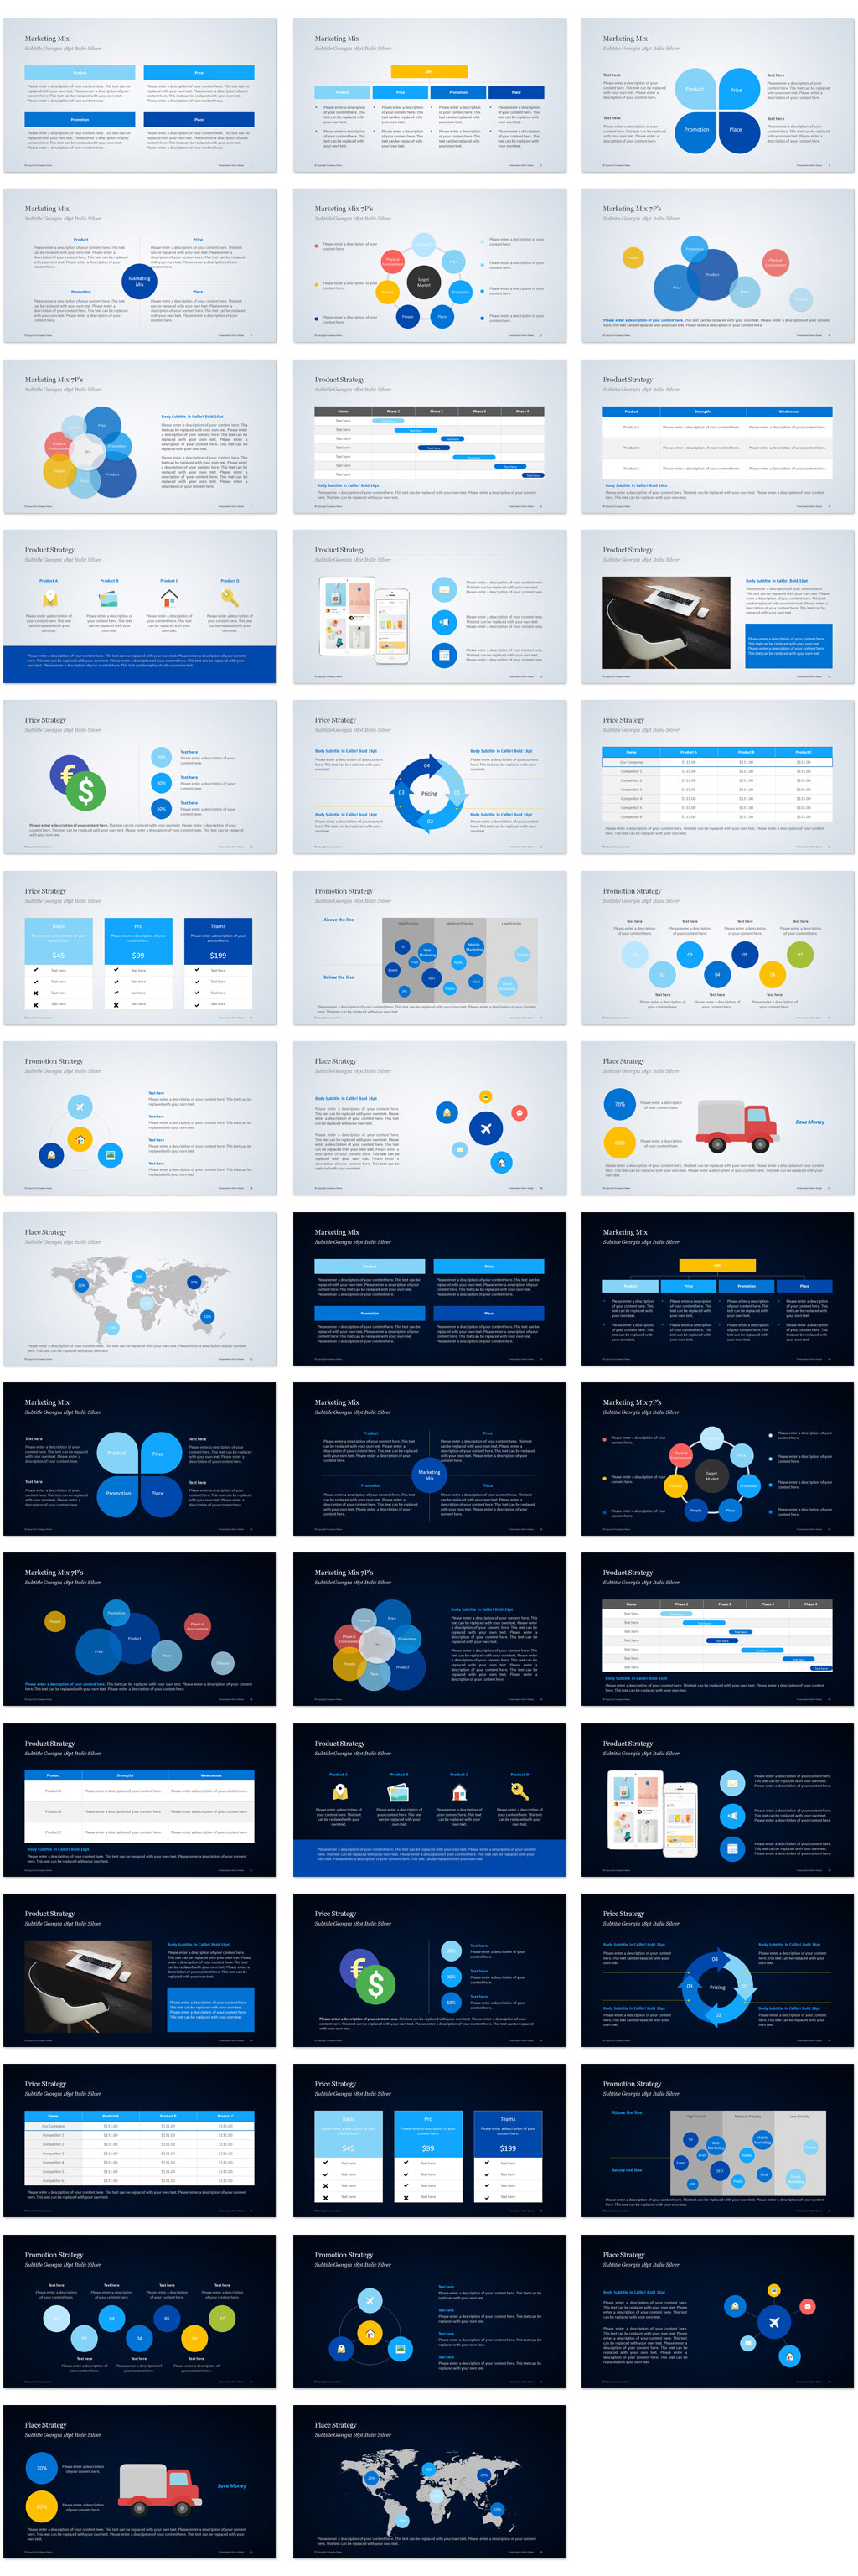 Marketing mix PowerPoint Templates